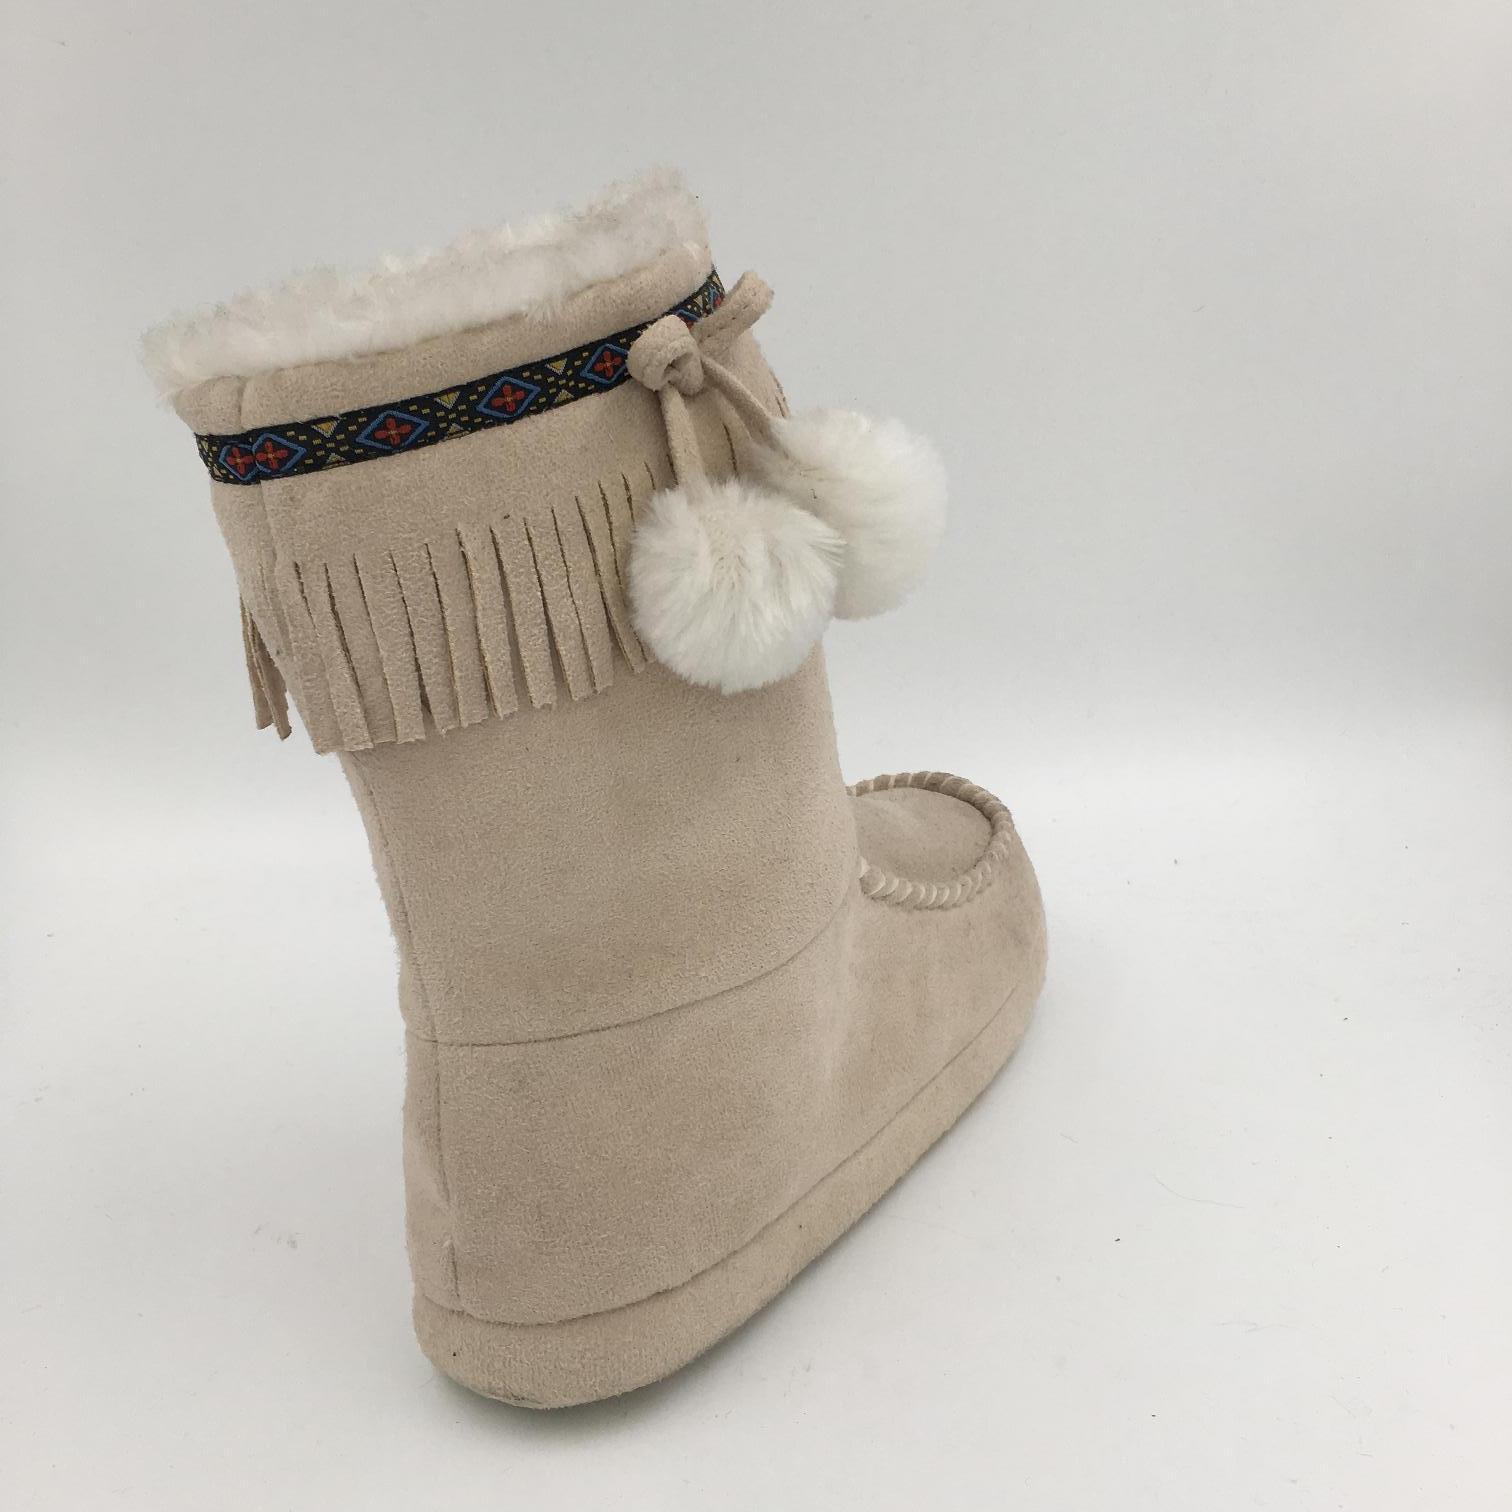 Cream Microfibire MID-Calf Indoor Boots for Lds